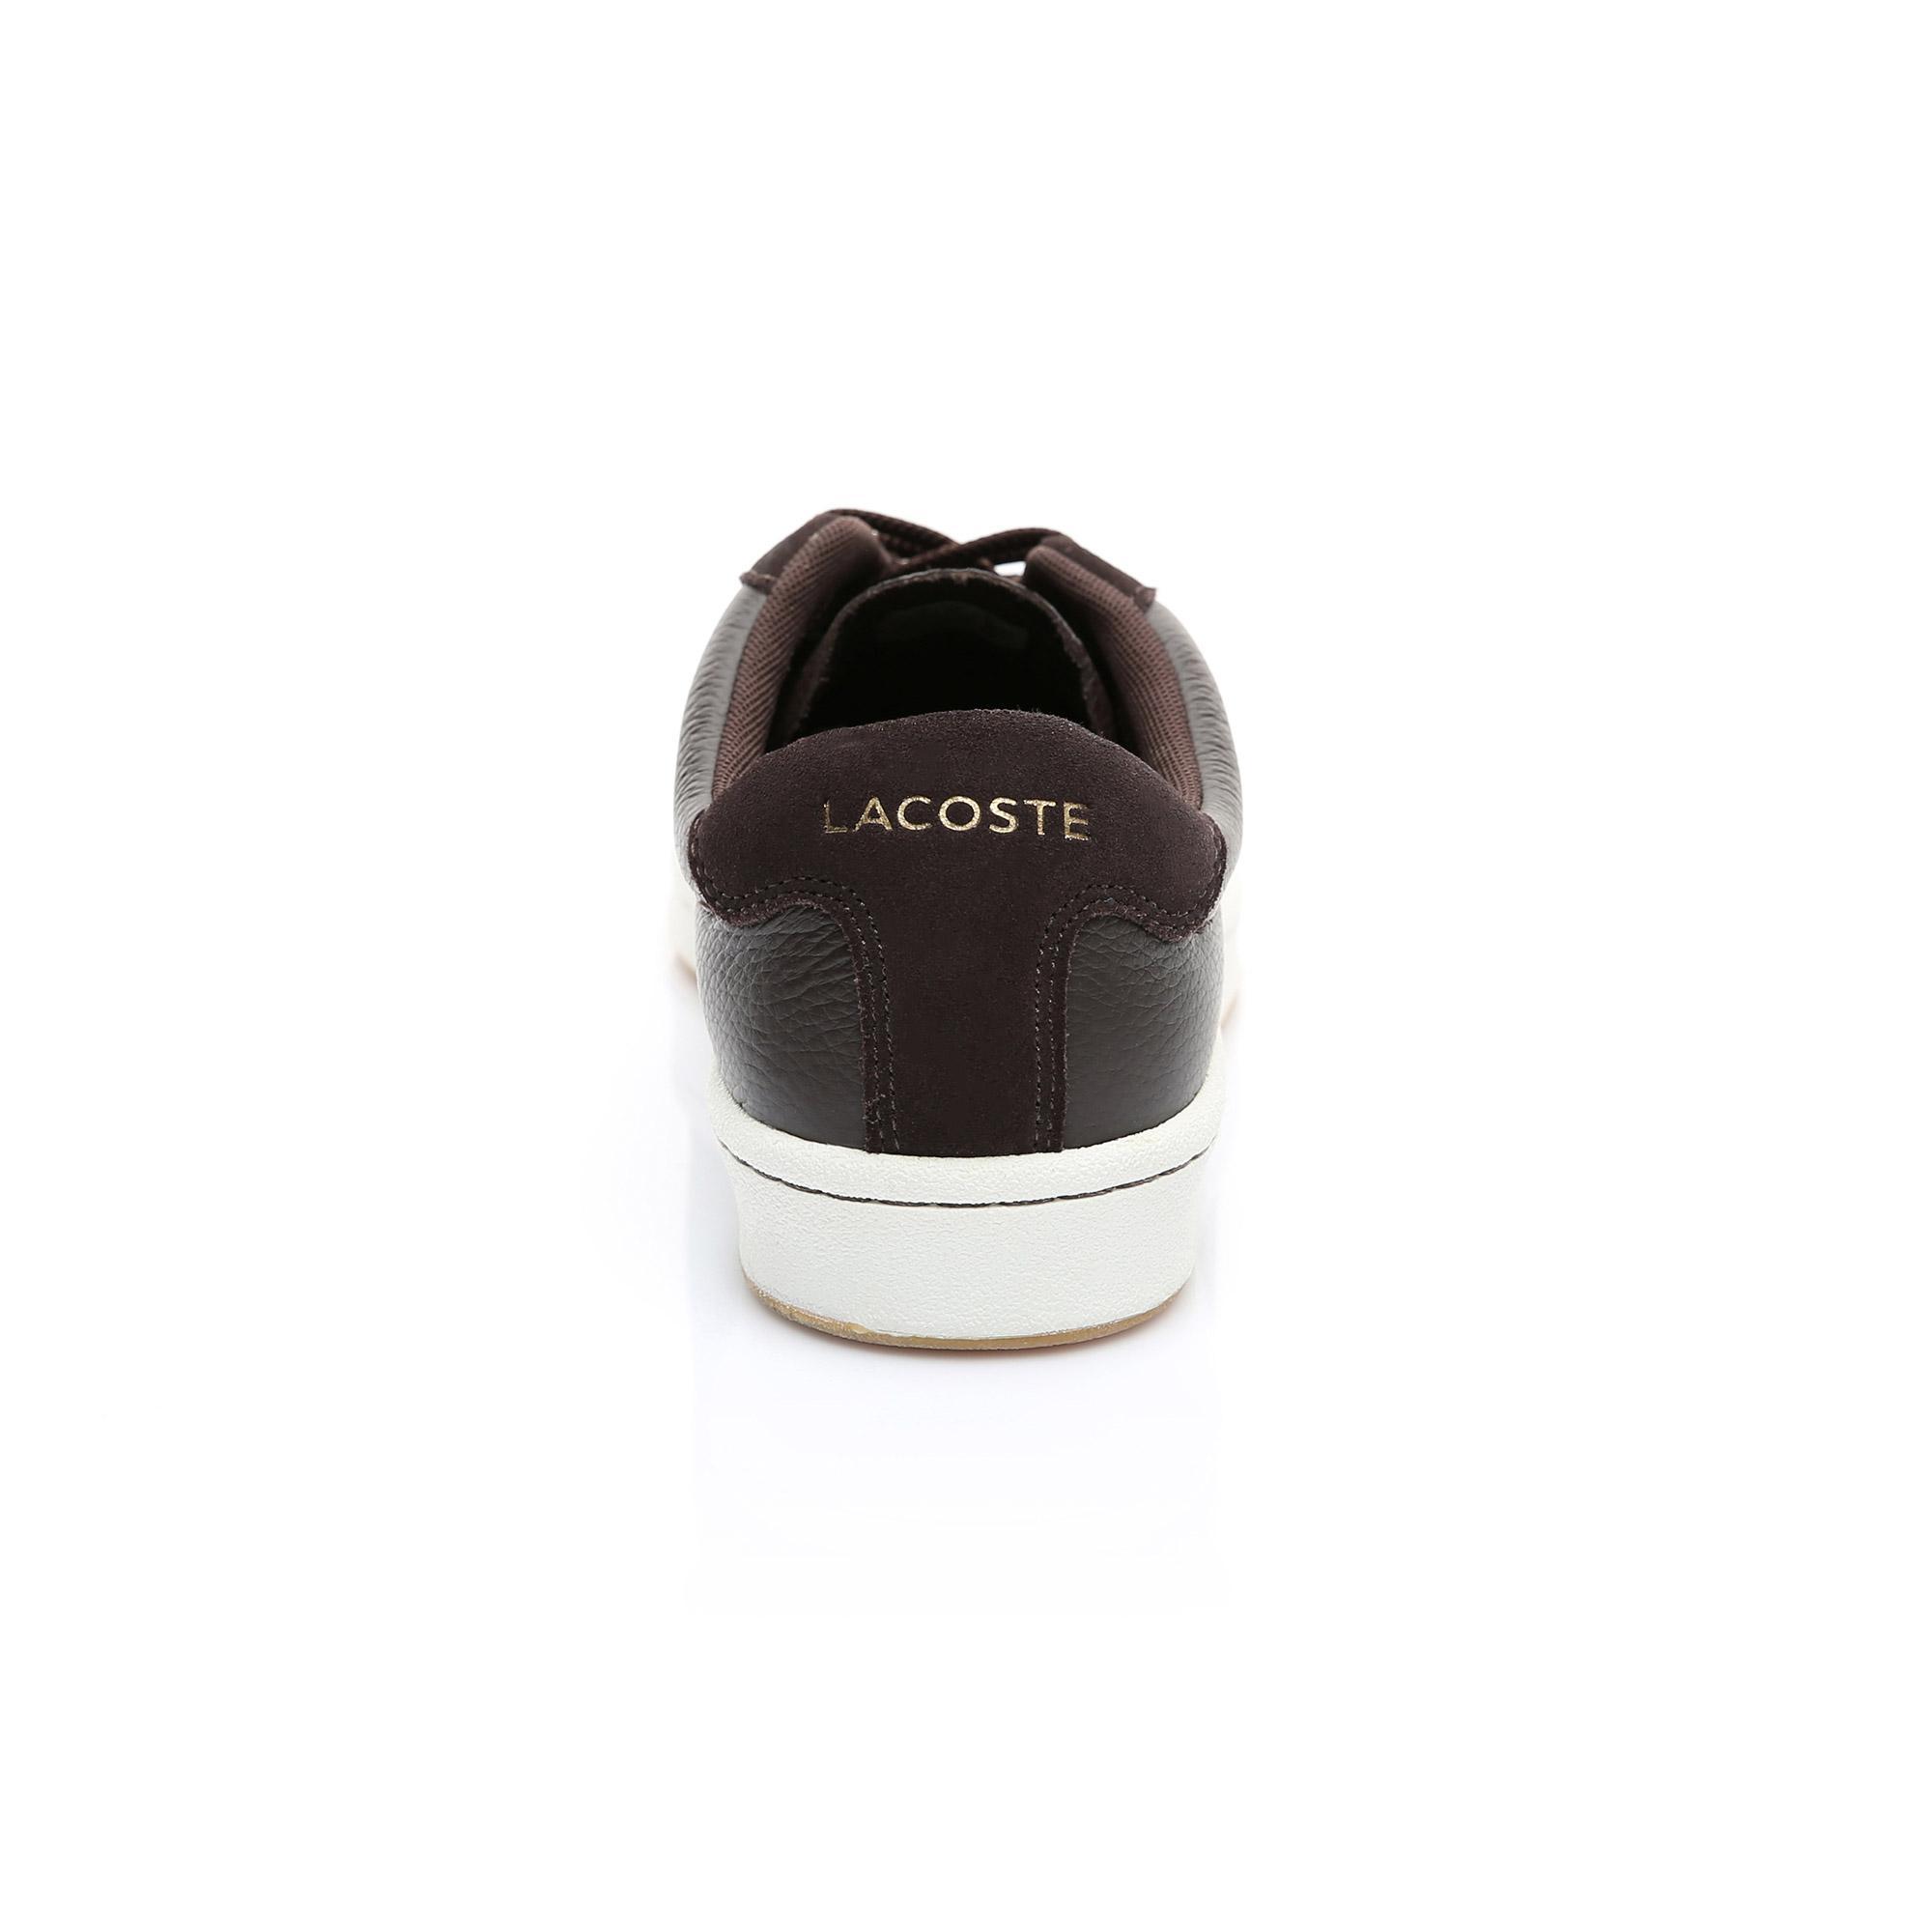 Lacoste кросівки чоловічі Masters